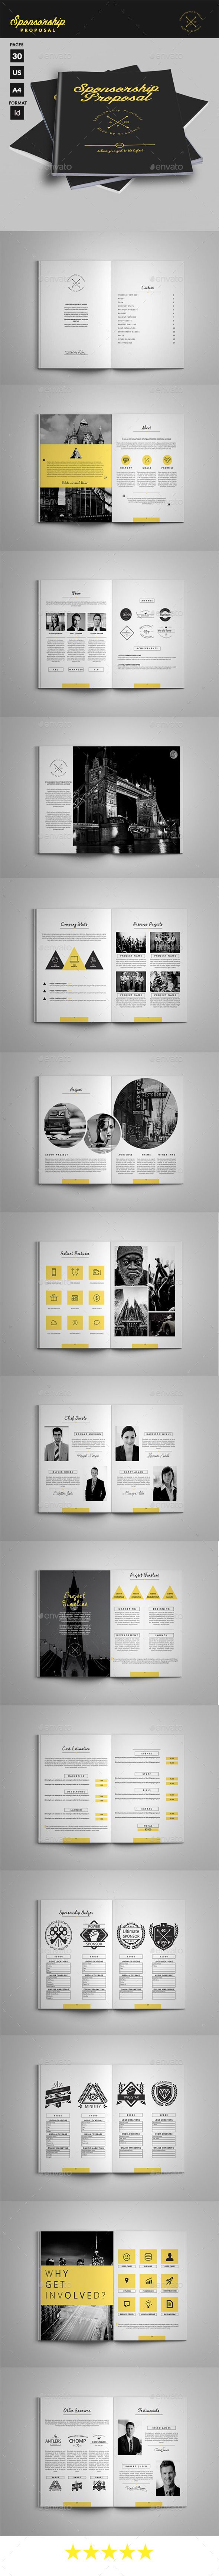 Sponsorship Proposal Template #design Download: http://graphicriver.net/item/sponsorship-proposal/12838670?ref=ksioks